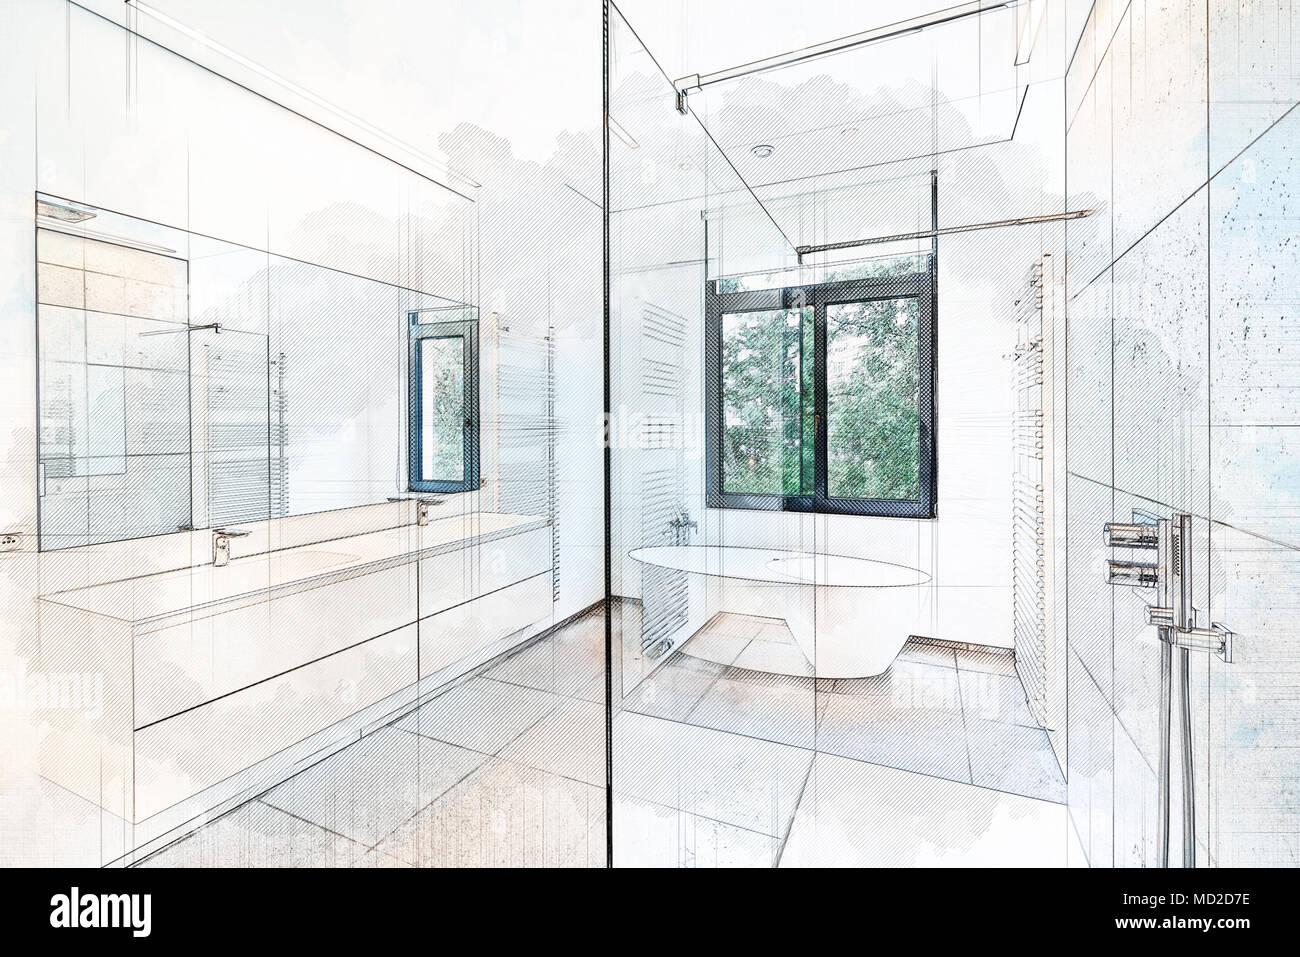 Vasca Da Bagno Restauro : Smalto vasca da bagno bagno